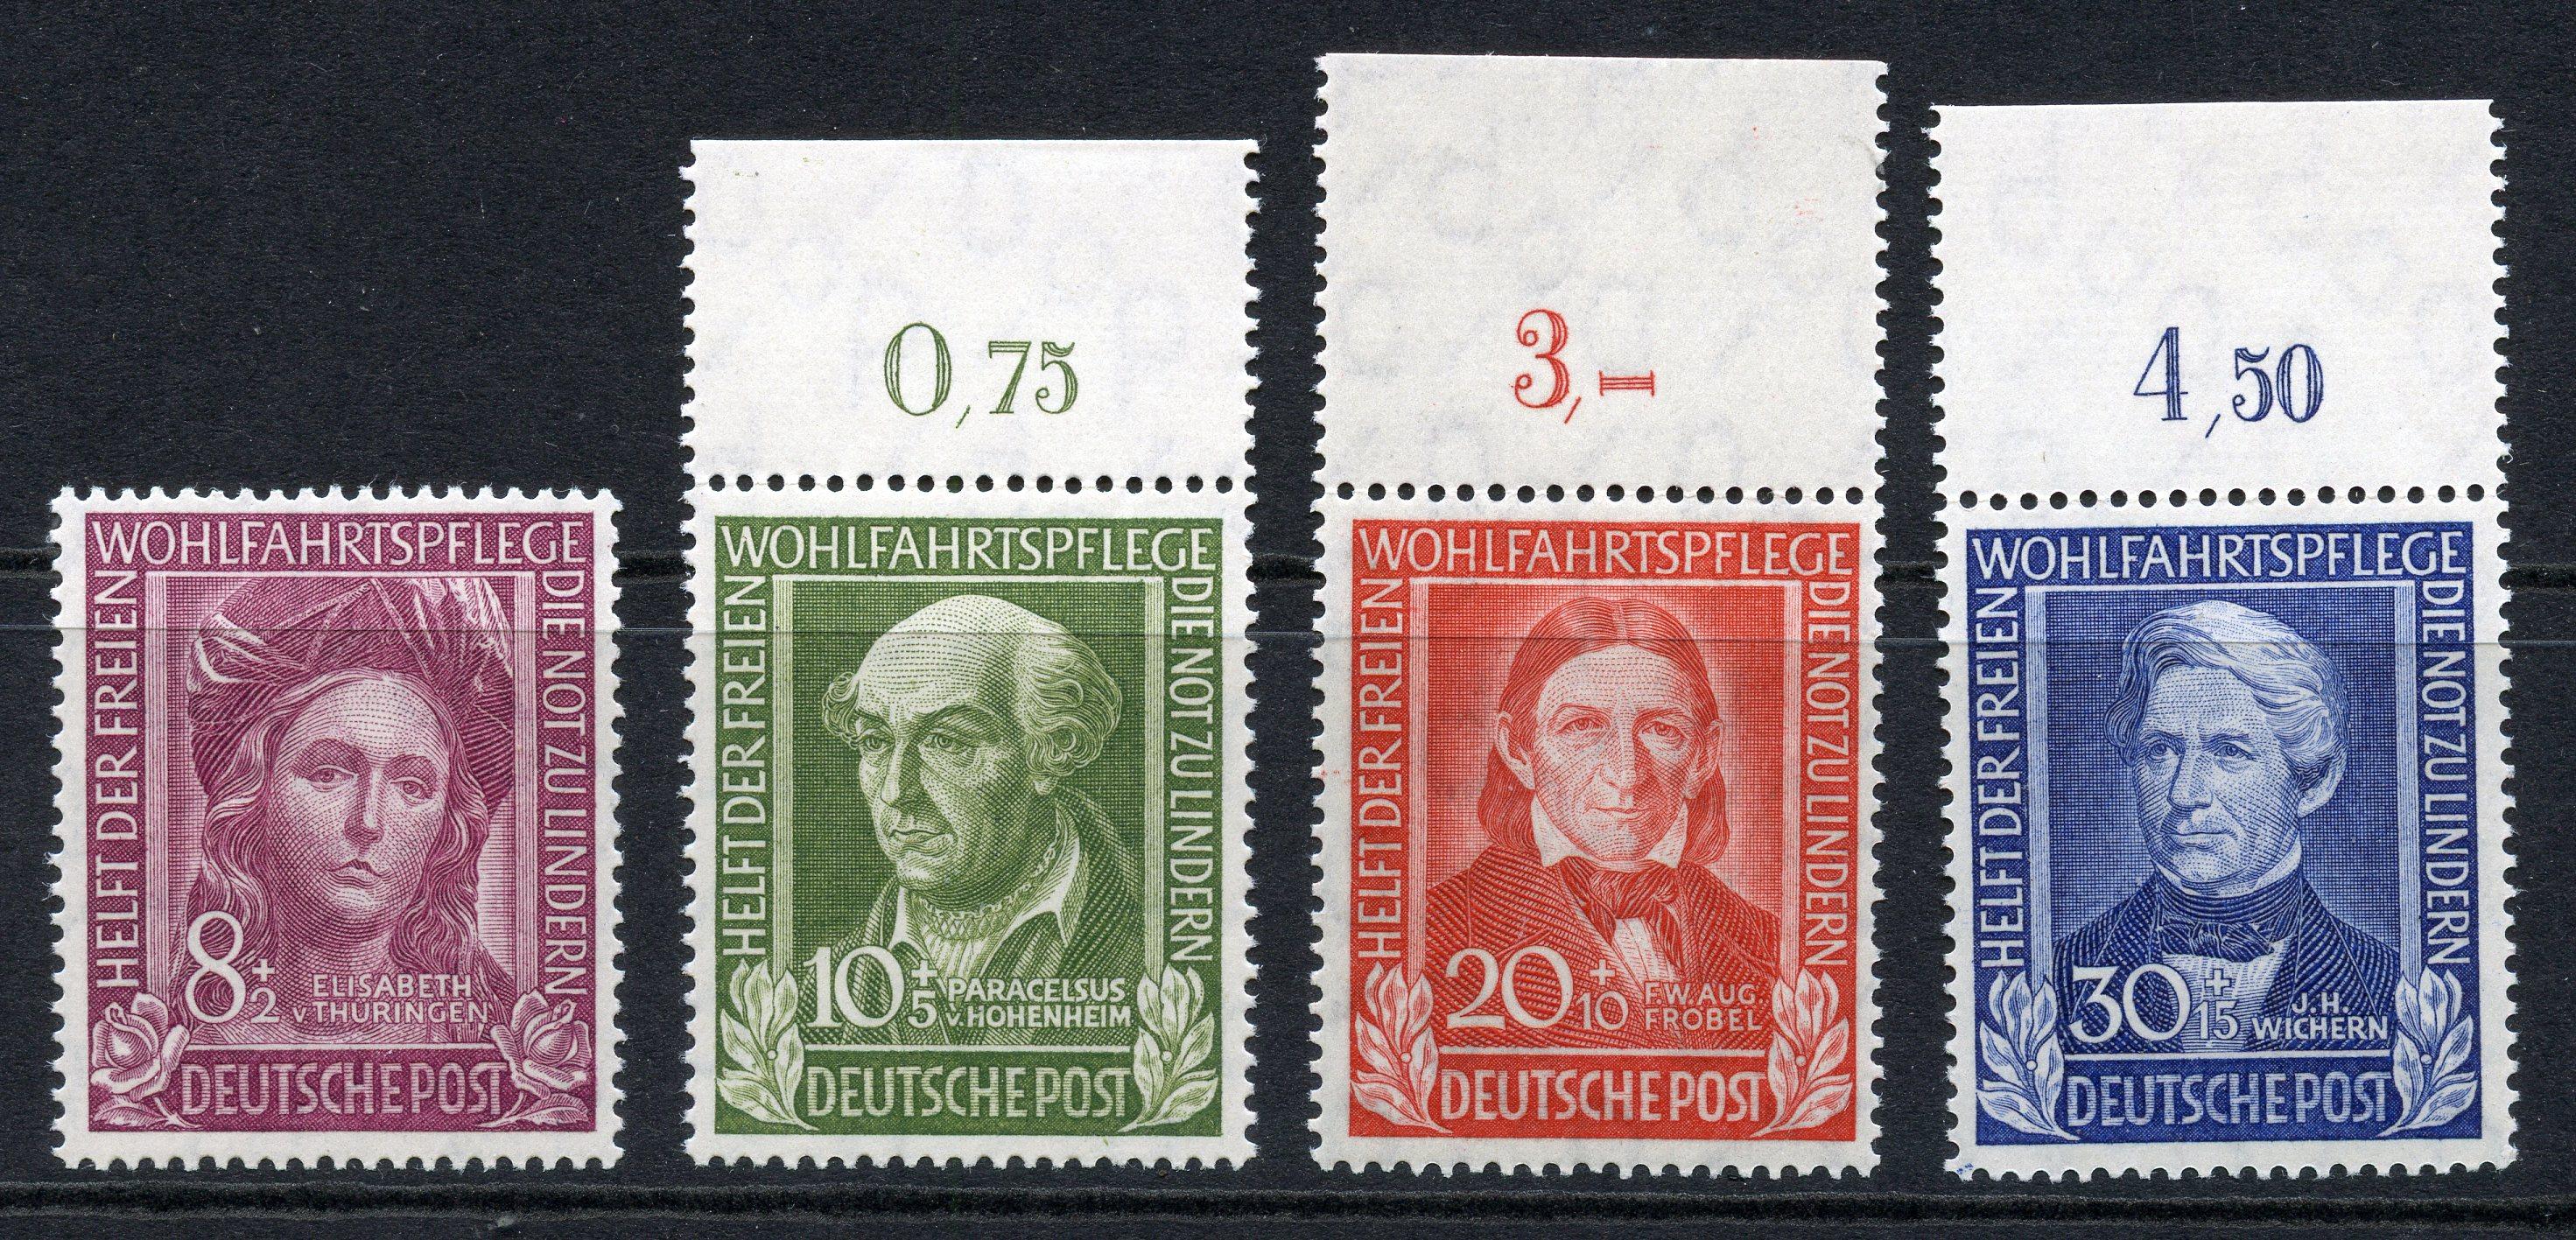 GERMANY WEST 1949 Relief Fund set um. SG 1039 - 42. Cat £160.